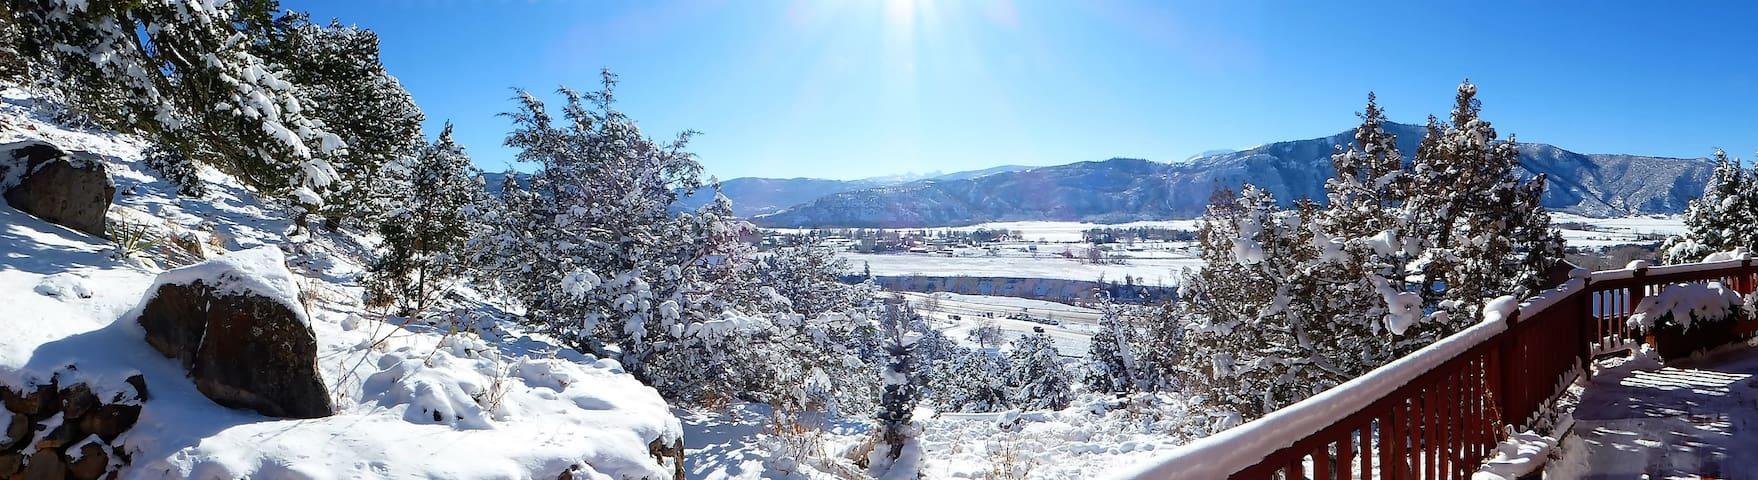 Ski Country Pied-A-Terre !!! - Basalt - Hus